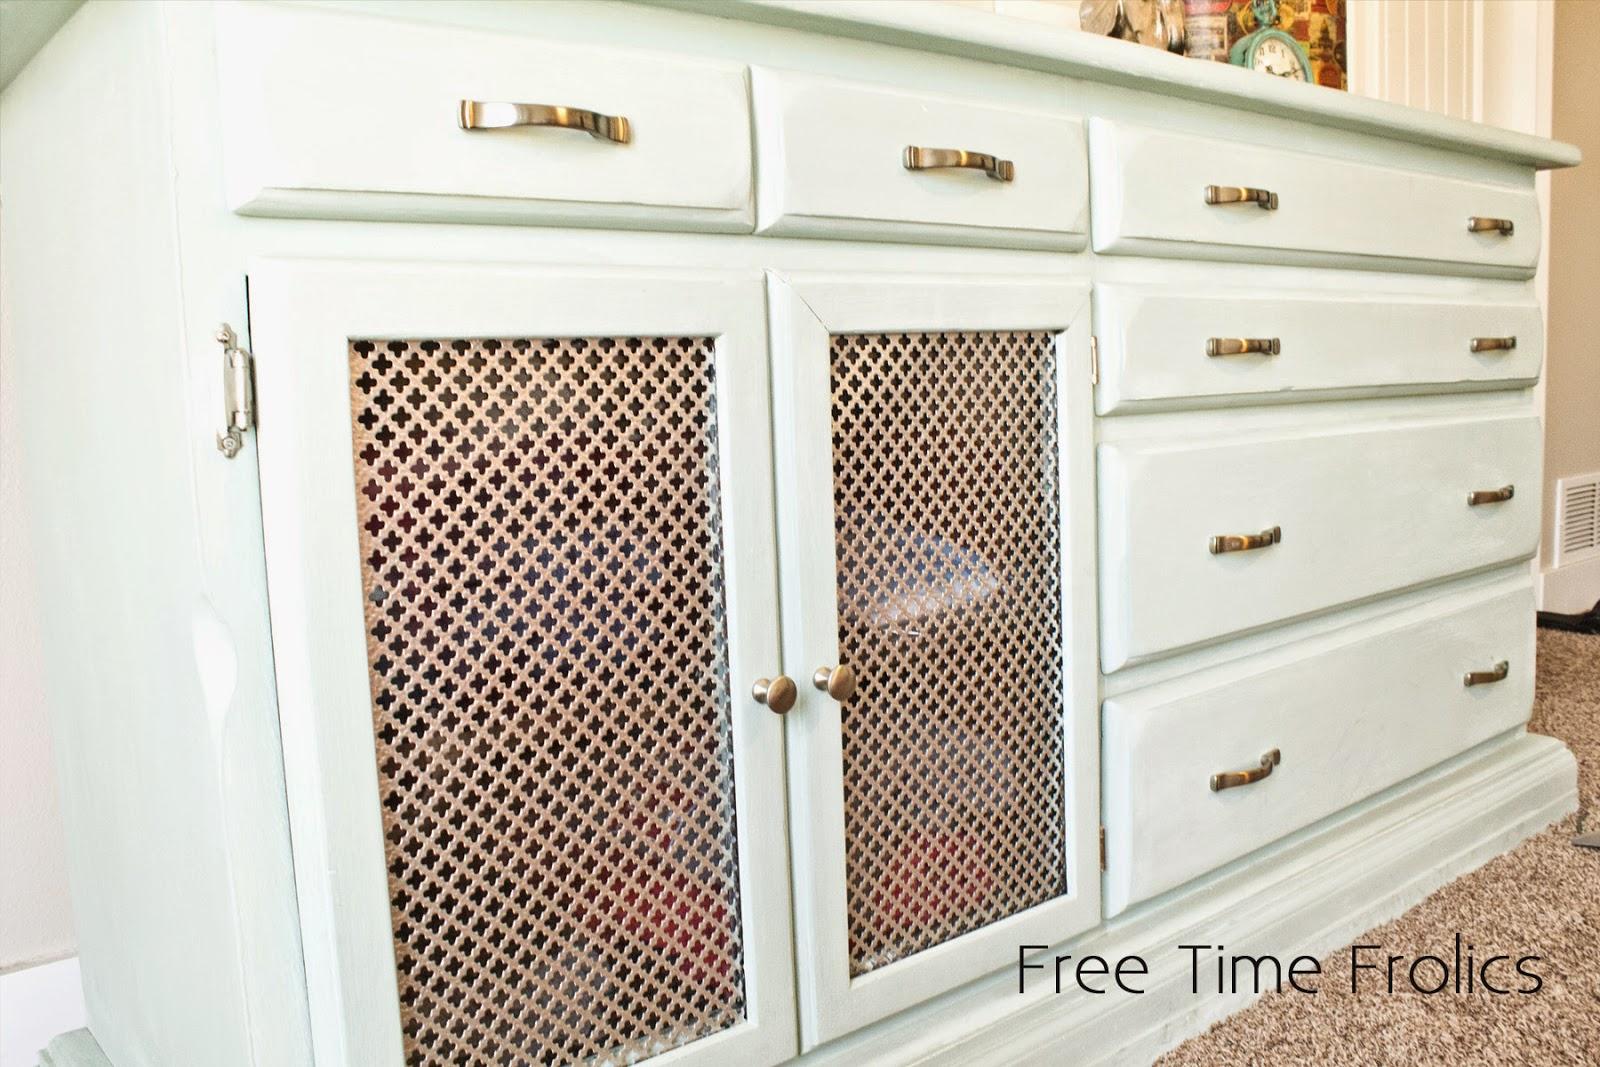 metal mesh doors for dresser redo www.freetimefrolics.com